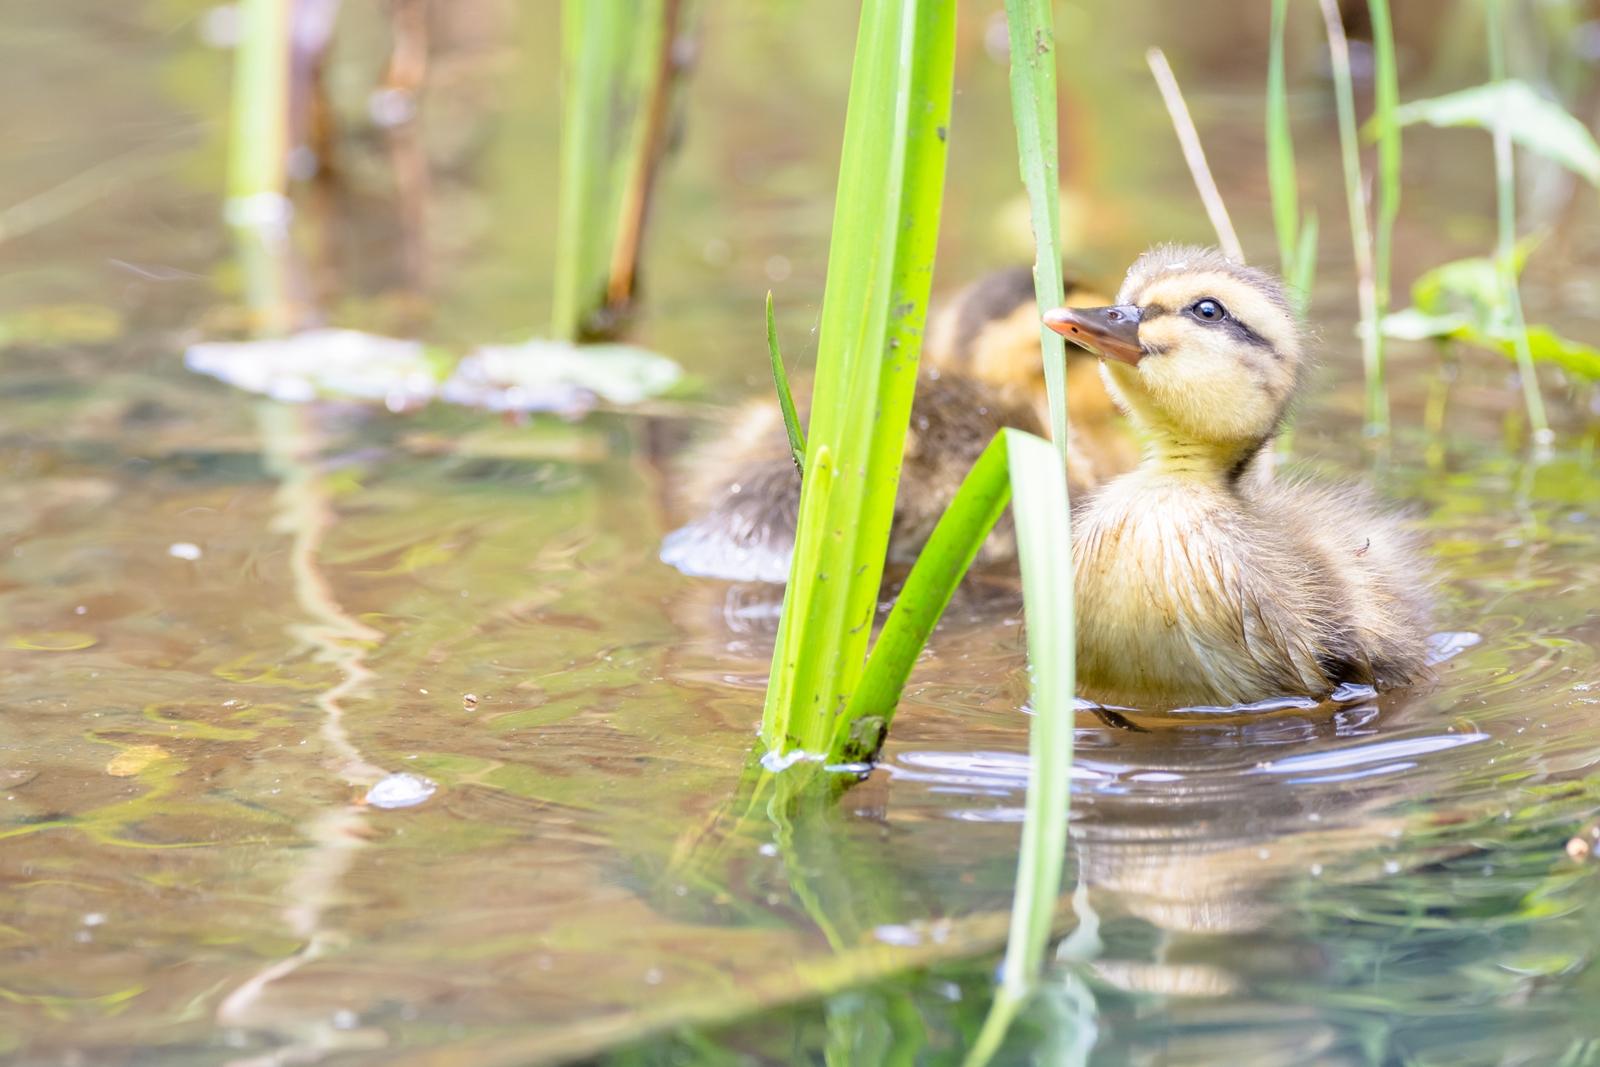 Photo: 好奇心いっぱい Full of curiosity.  気になったら止まらない 夢中になって 見て、触れて、感じて とても大切な 知るということ  Baby of spot-billed duck. (カルガモの赤ちゃん)  #birdphotography #birds #cooljapan #kawaii #nikon #sigma  Nikon D7200 SIGMA 150-600mm F5-6.3 DG OS HSM Contemporary  ・小鳥の詩朗読 /poetry reading https://youtu.be/c5m06tqo5-o?list=PL2YtHGm0-R3qVsaqvQe9OYdJFCkI98wzF